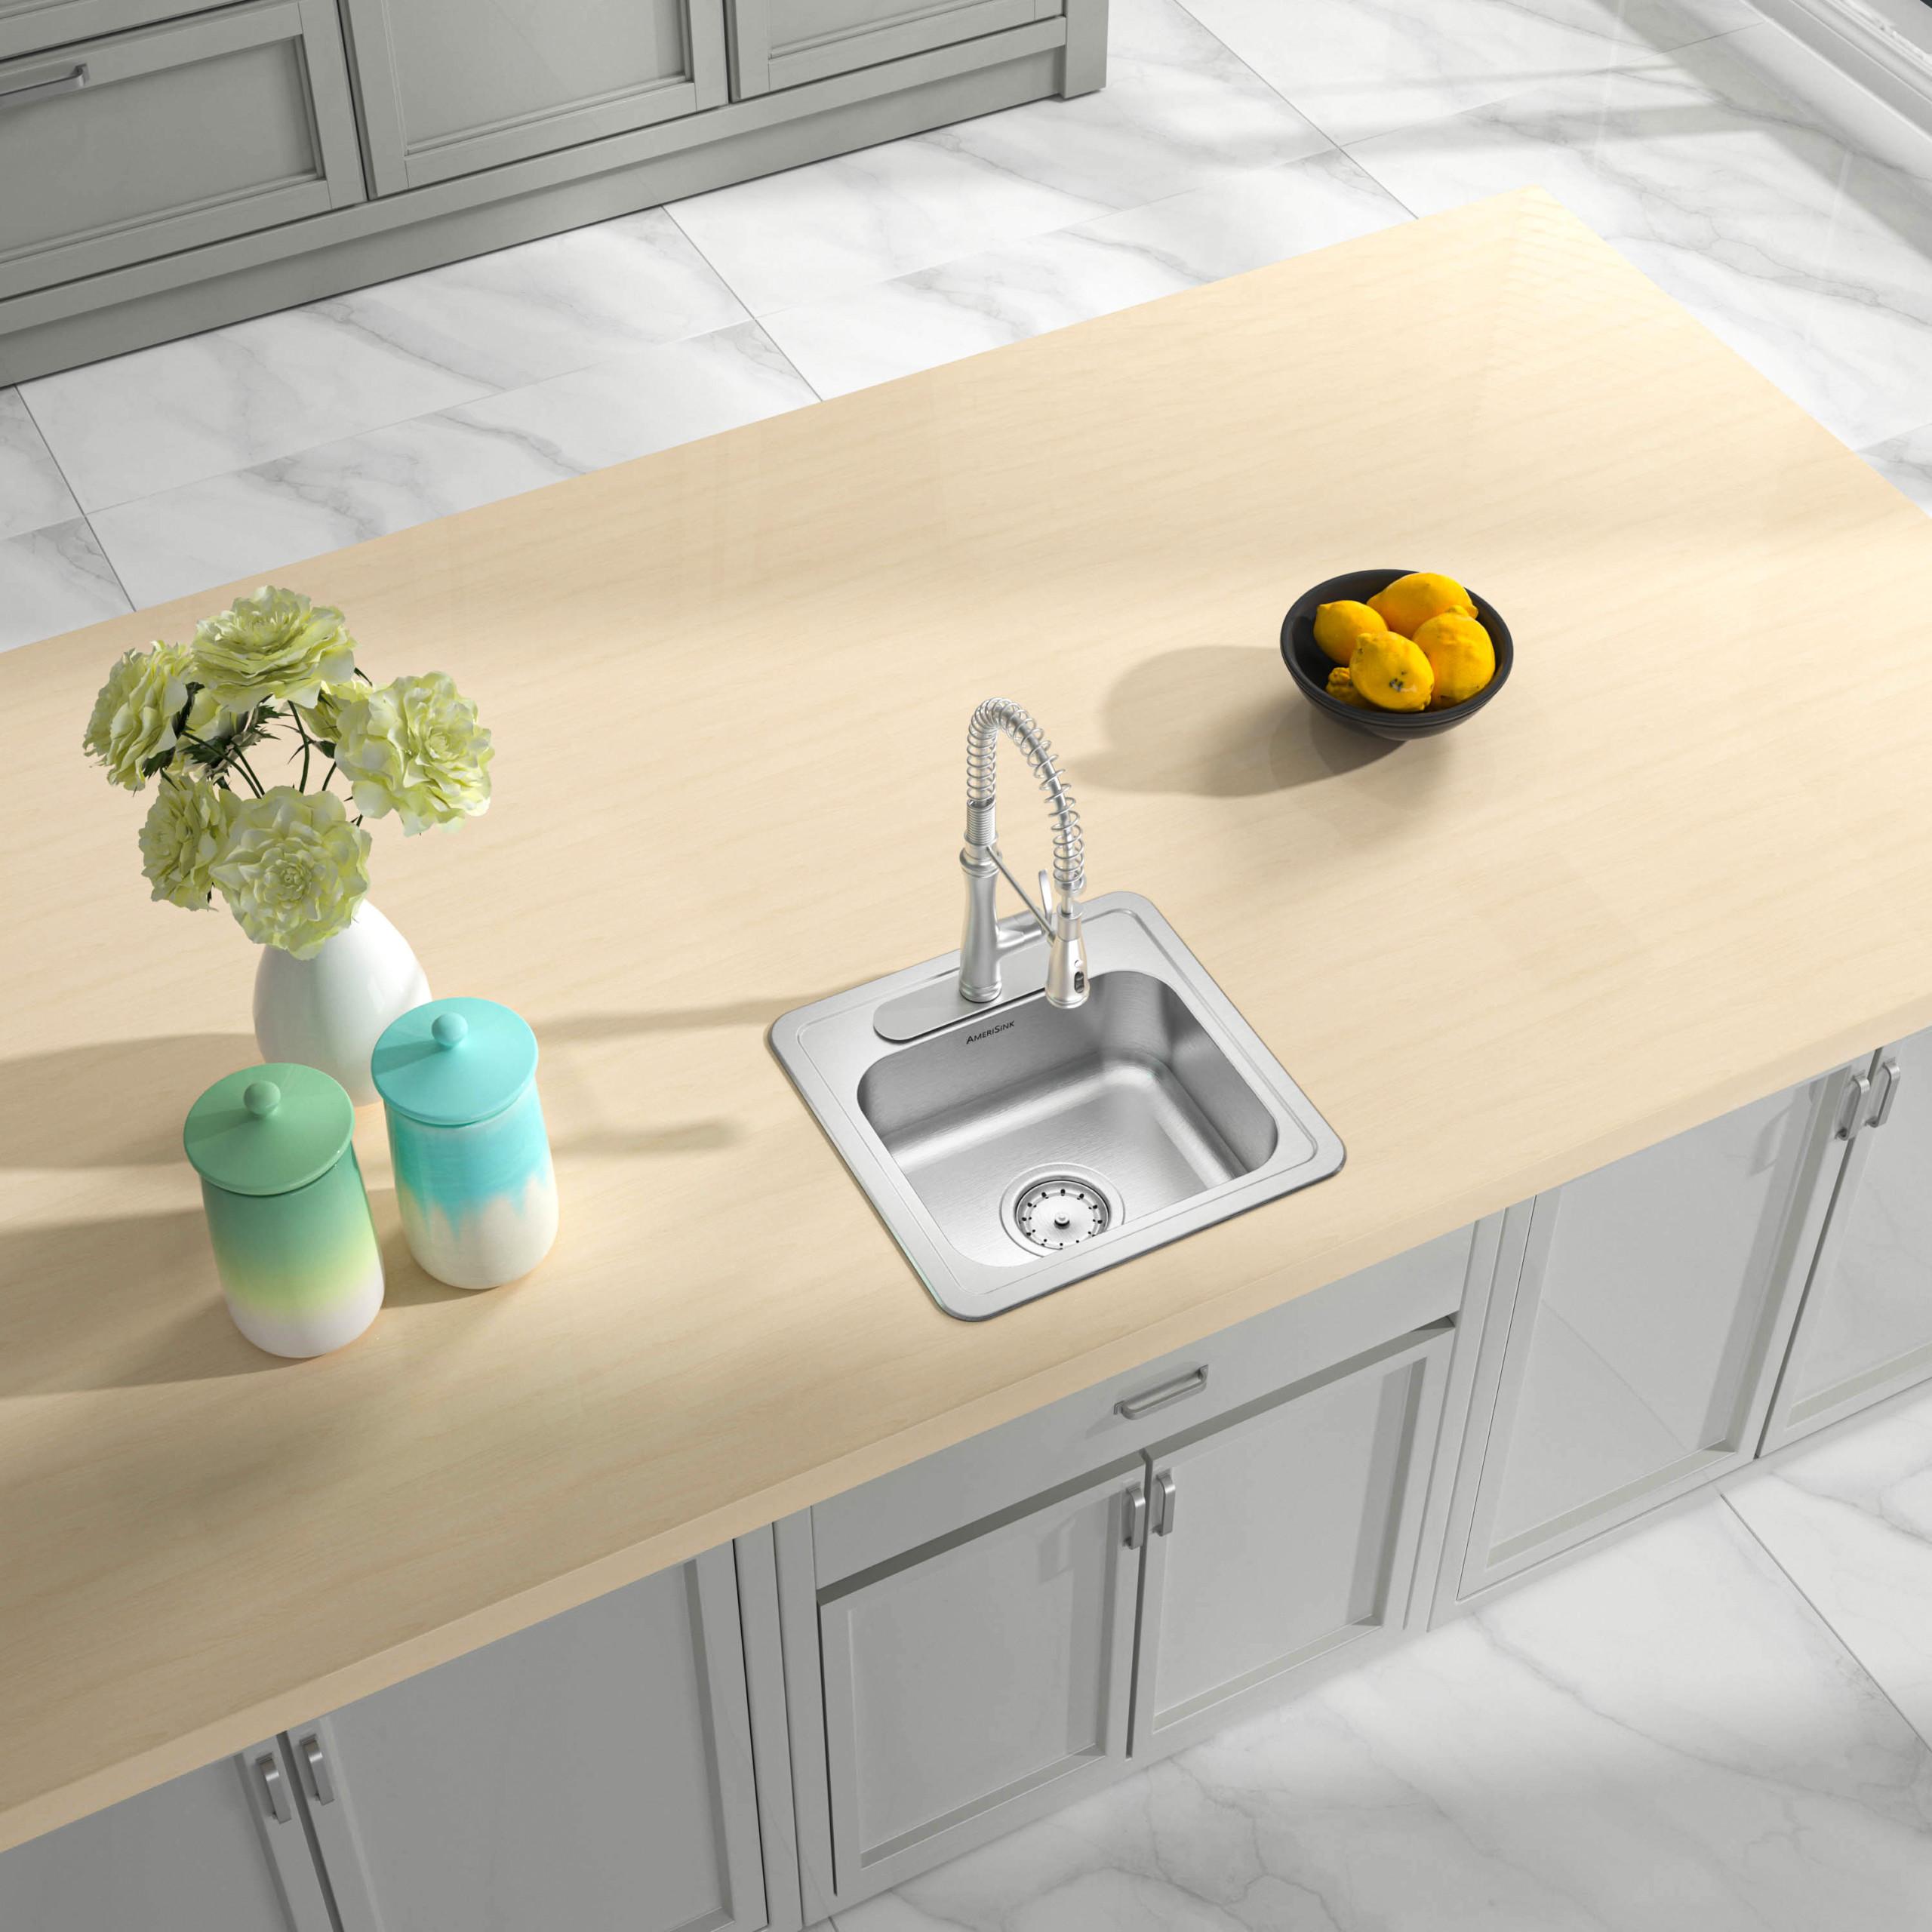 as138 15 x 15 x 5 5 22g single bowl topmount economy stainless steel bar sink